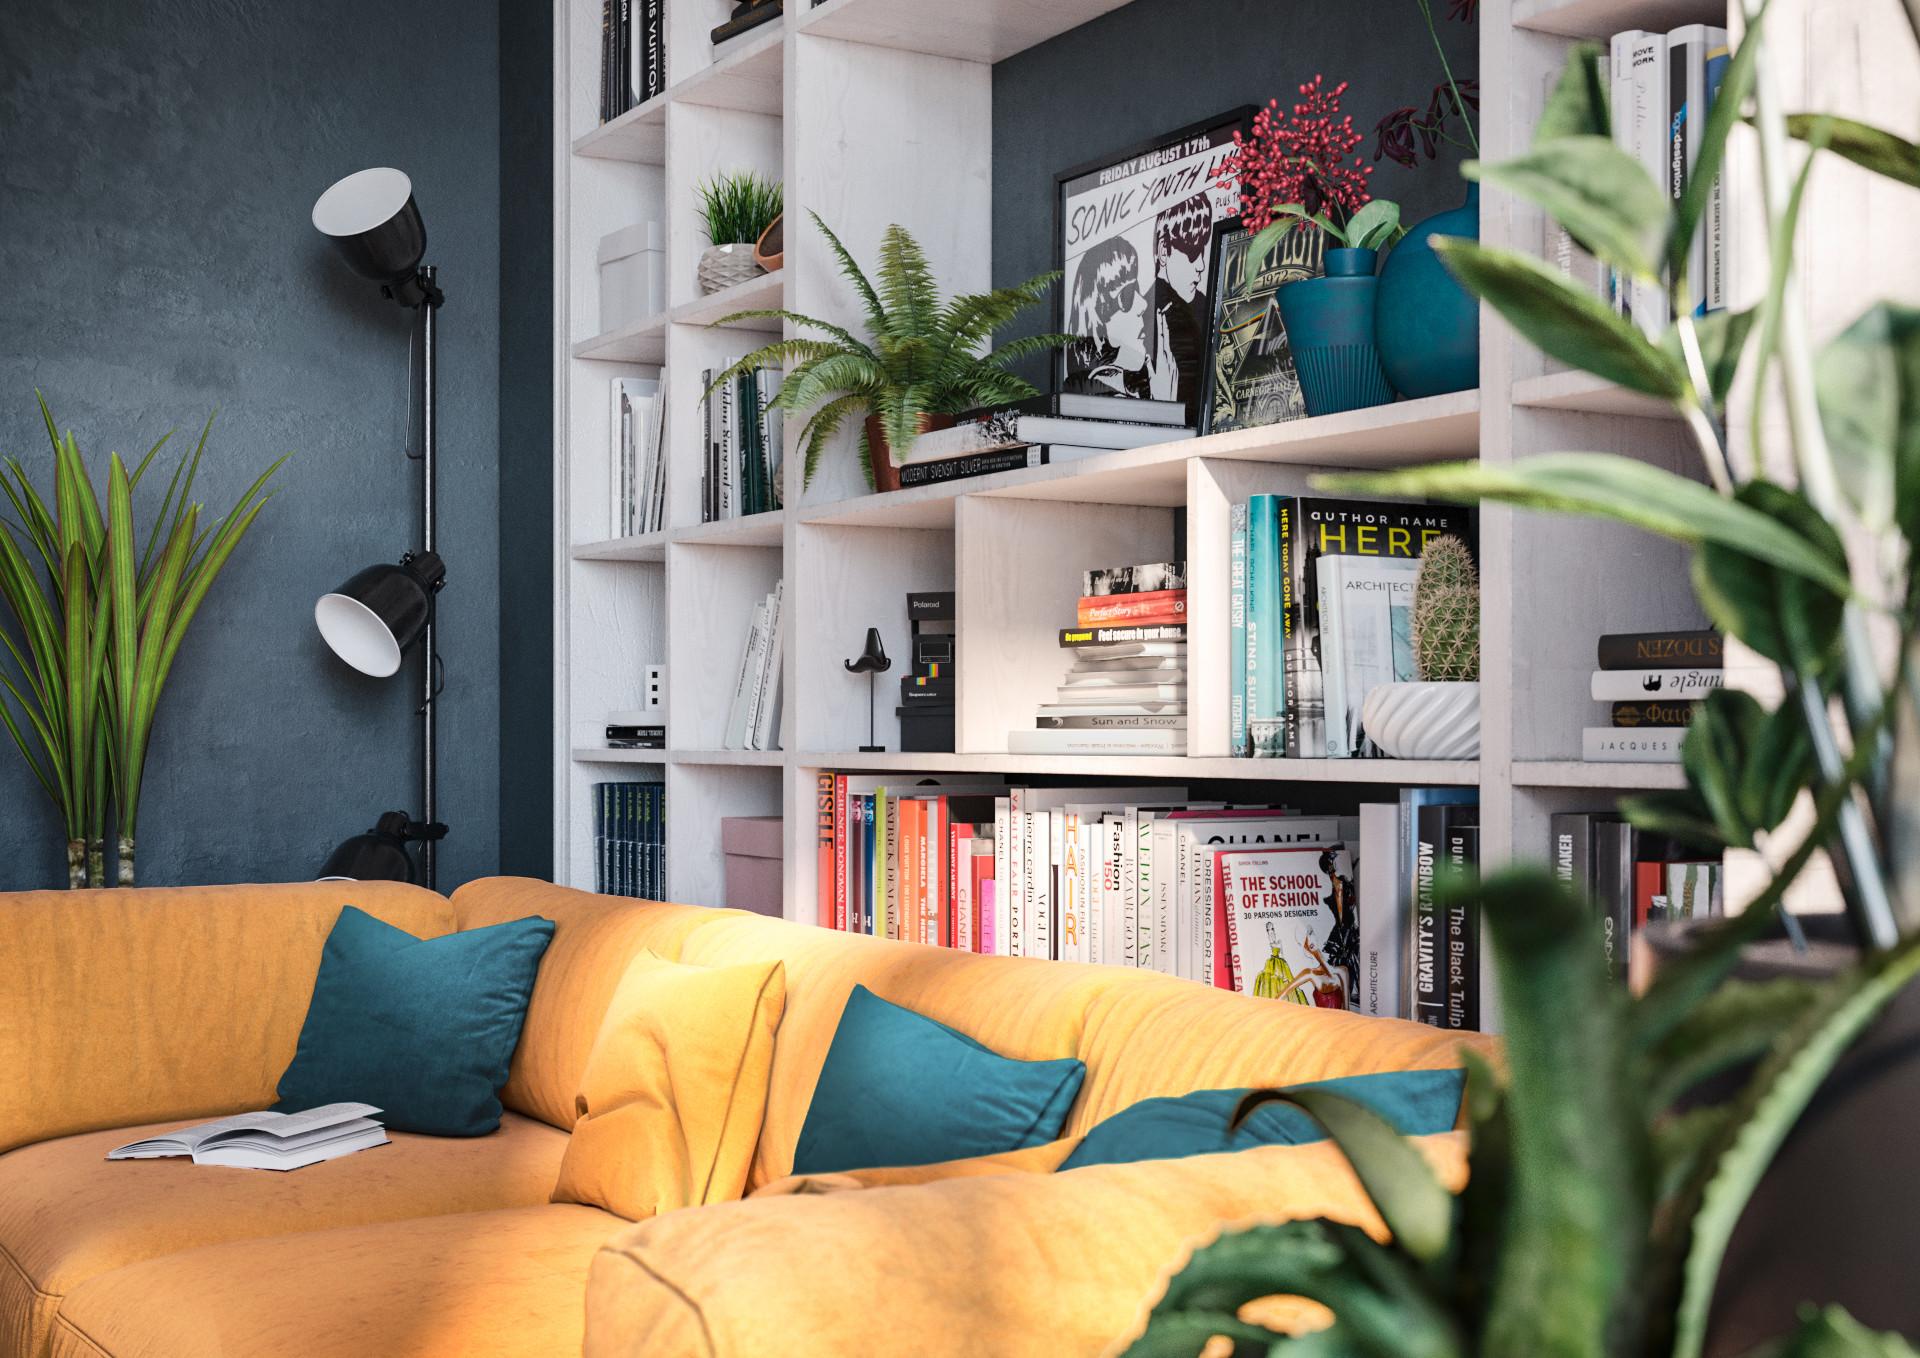 Alex langletz living room 03 001 srgb